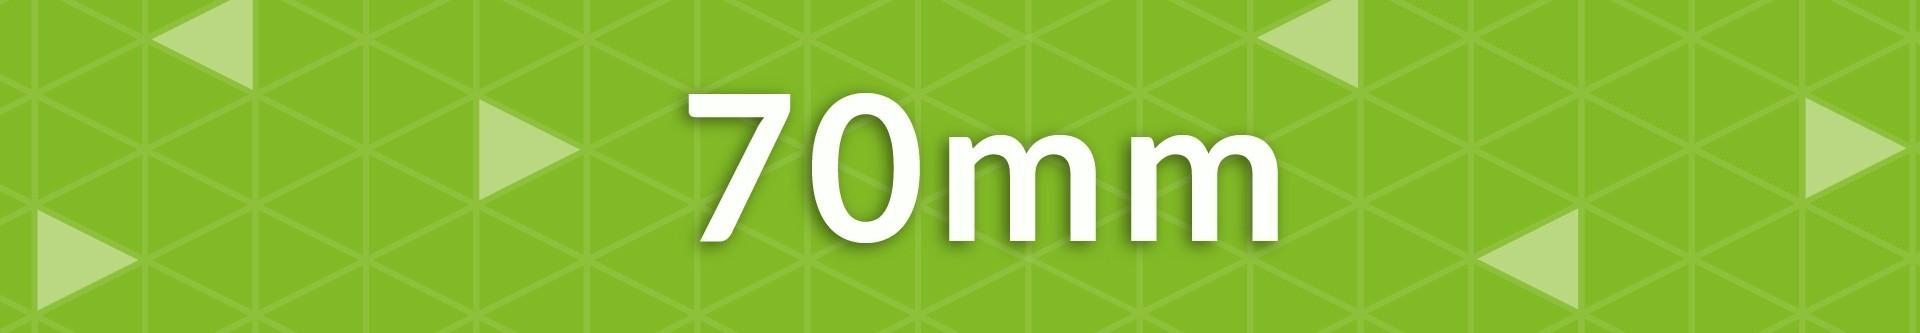 Casas de madera 70mm